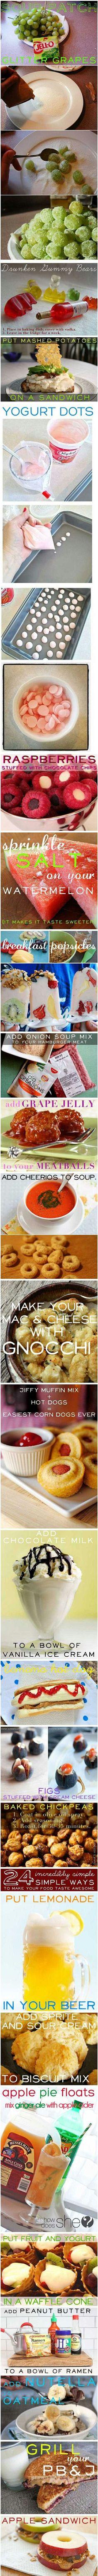 Sounds yummy!